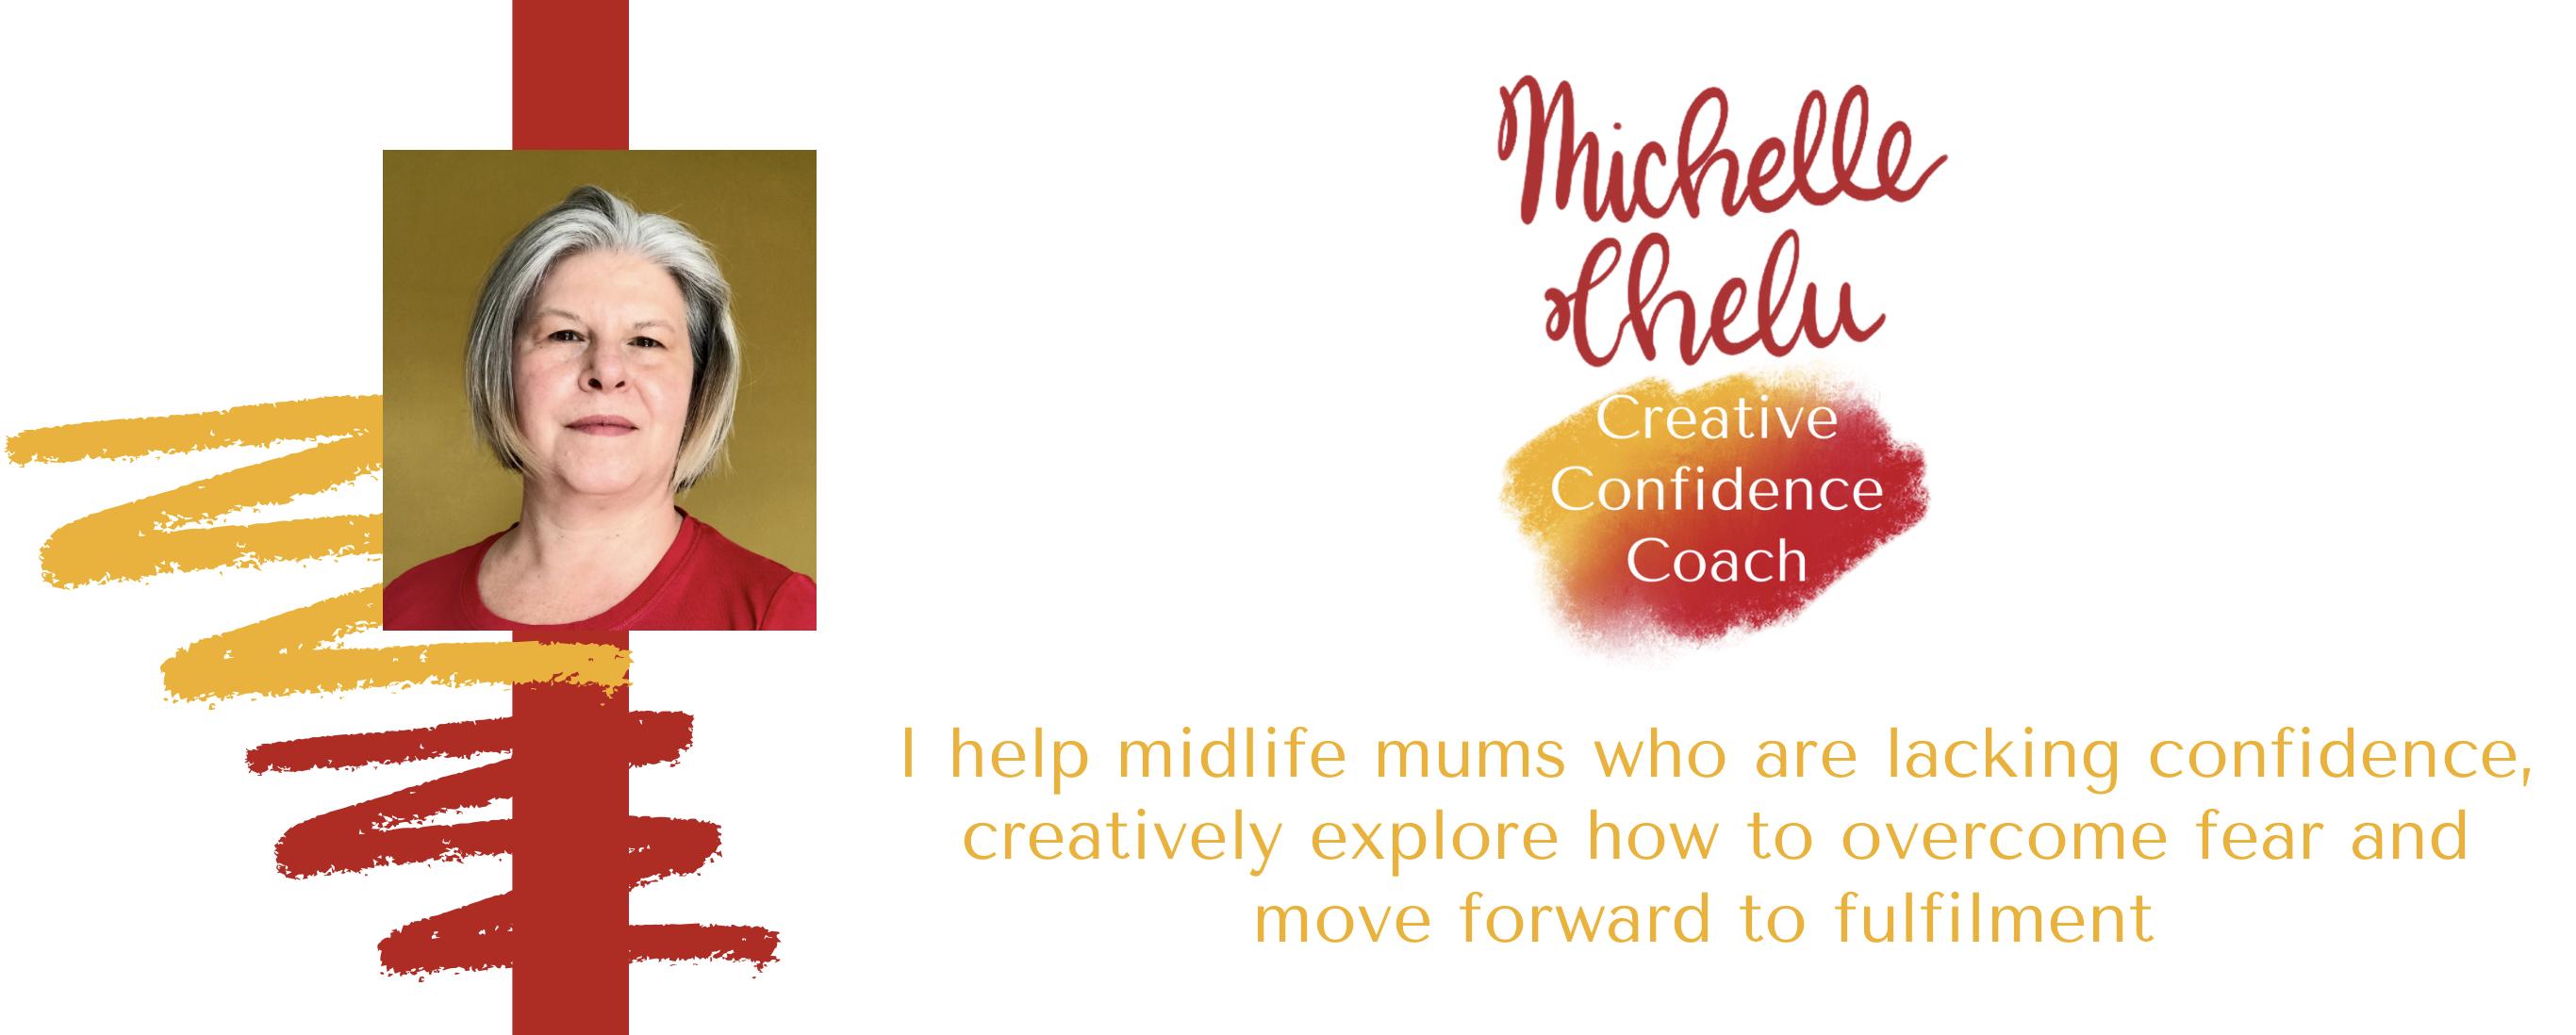 Michelle Chelu